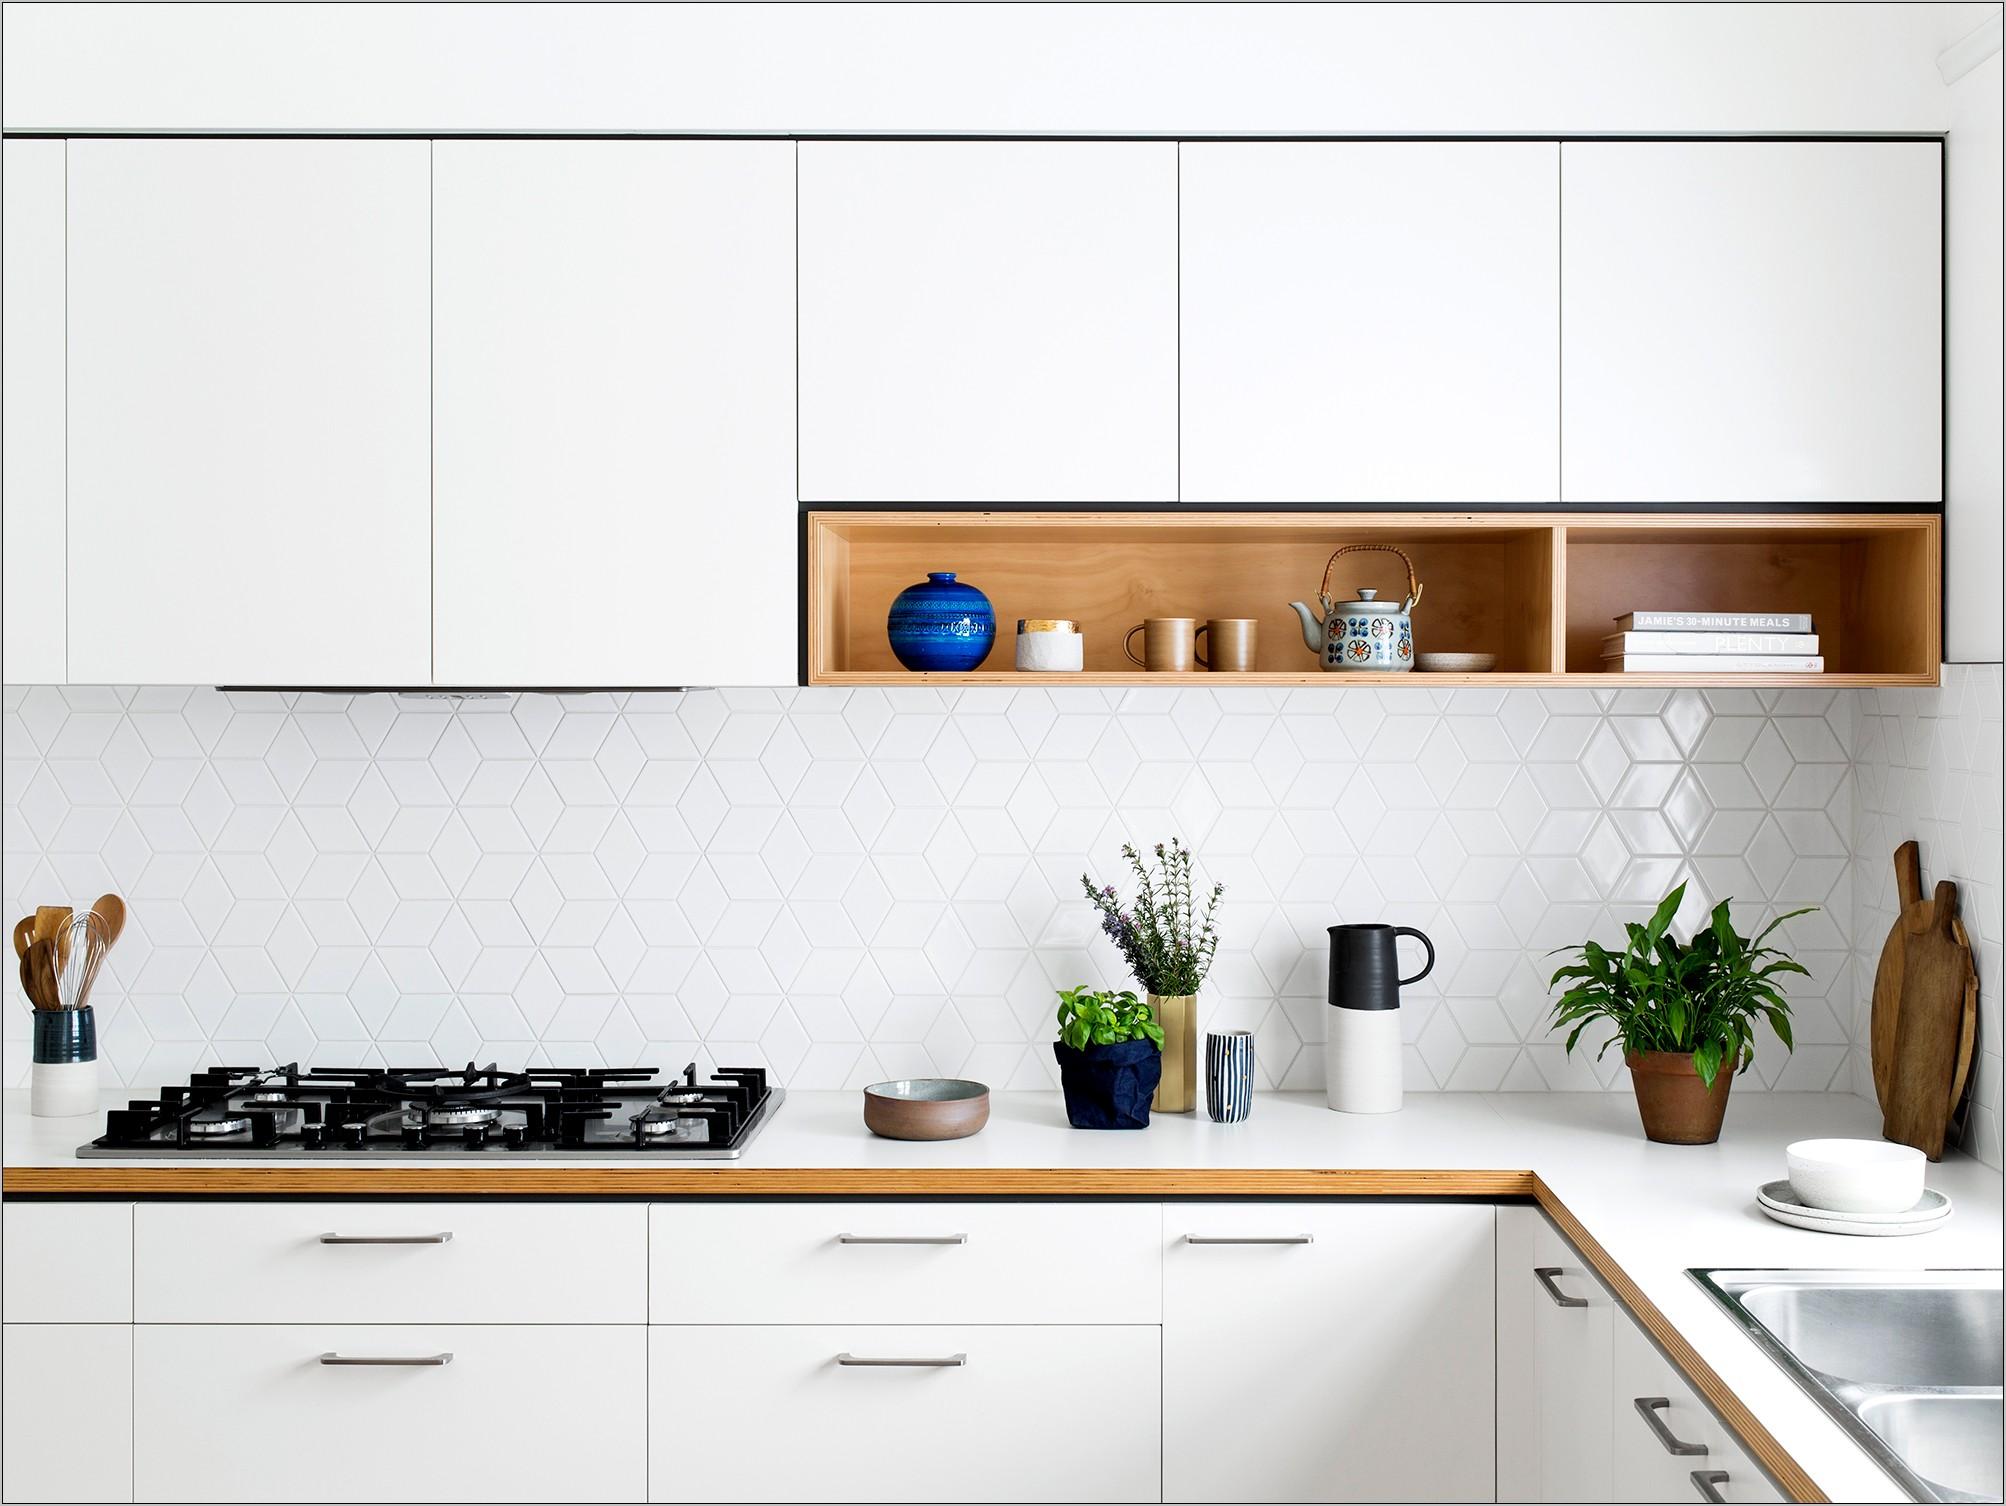 Kitchen Decor Ideas For Real Estate